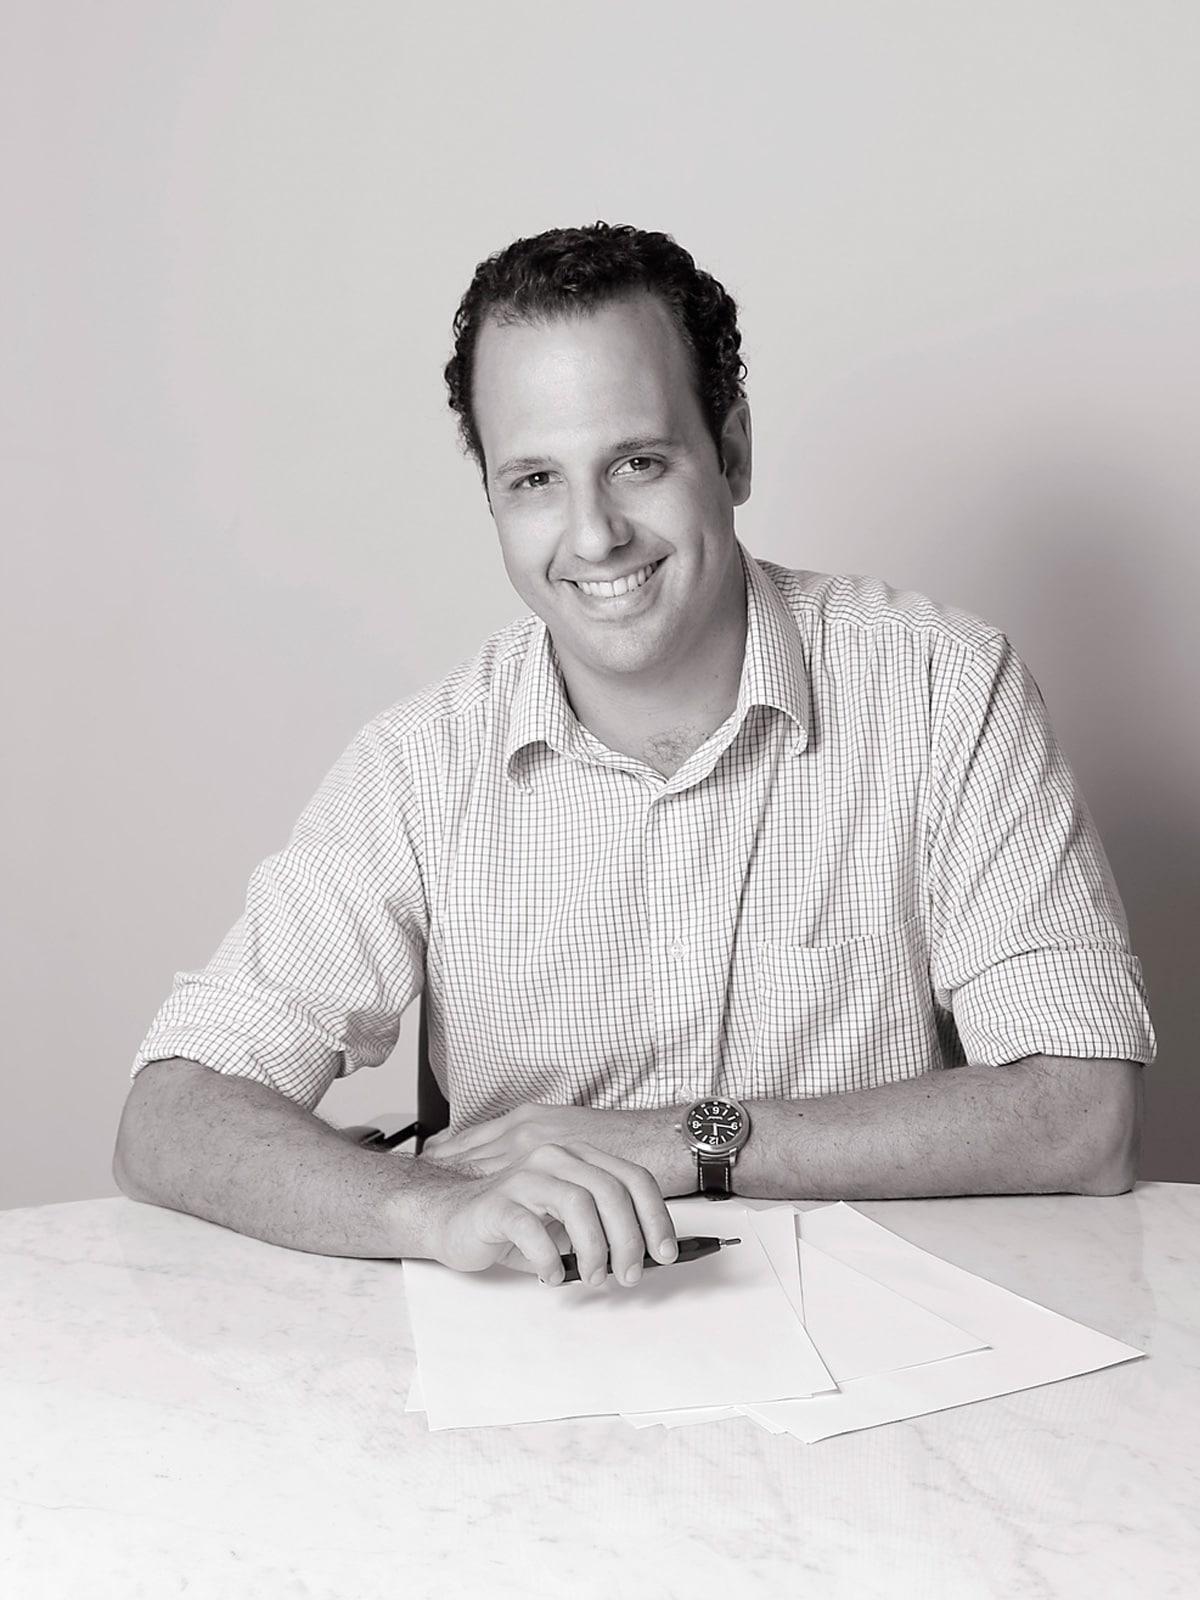 Designer Fernando Prado Art Director bei Lumini